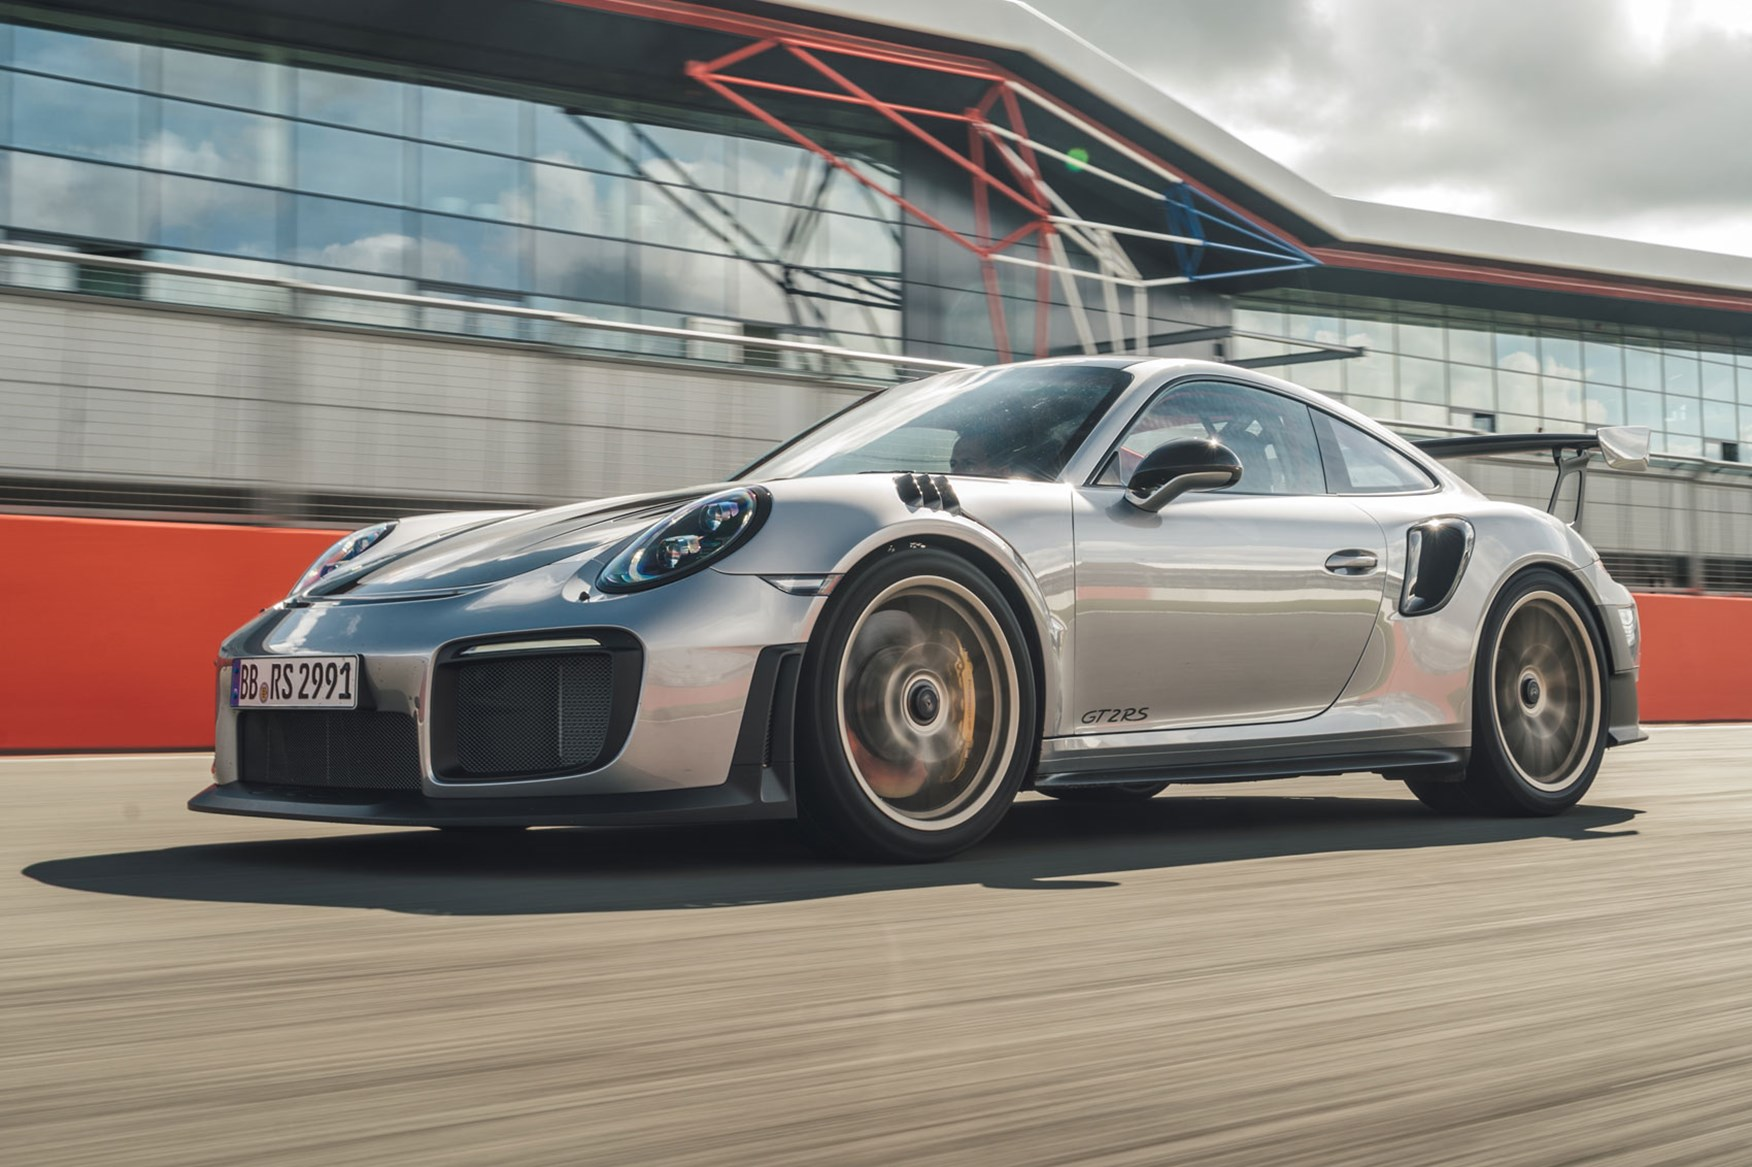 1_porsche-911-gt2rs-50 Wonderful Porsche 911 Gt2 Rs Review Cars Trend